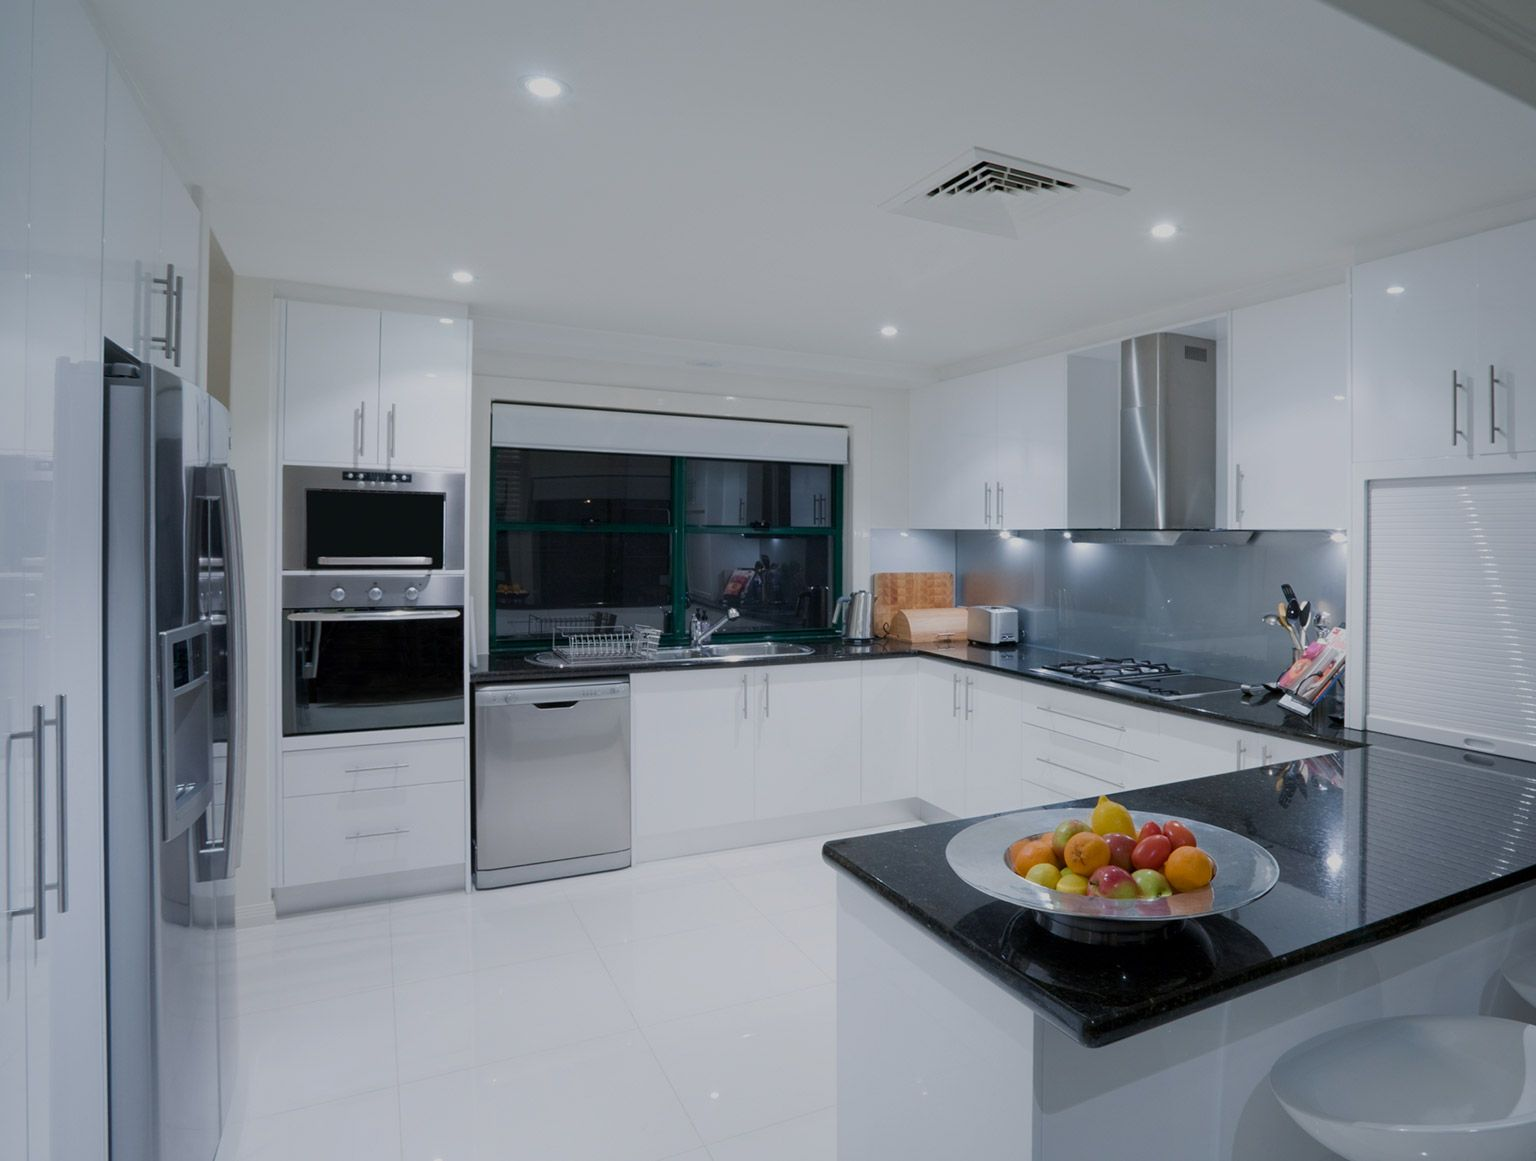 kitchen accessories design%0A My Edward Andrews Design Center style is Simply Sleek